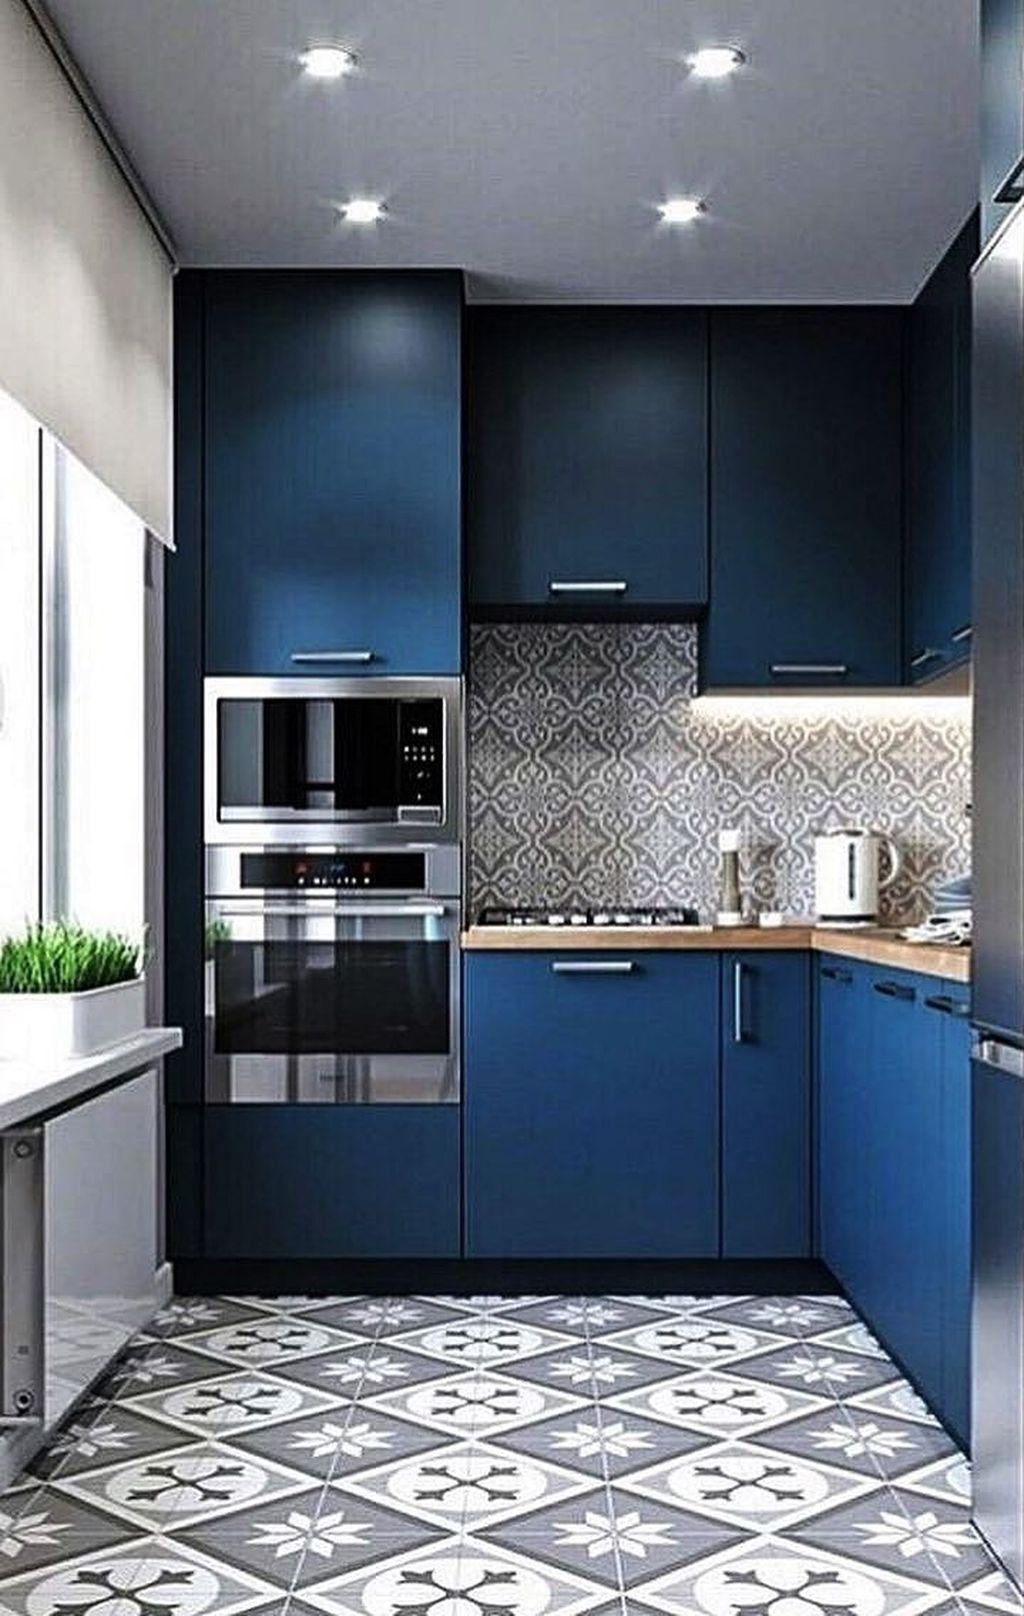 20 Gorgeous Small Kitchen Design Ideas For Your Small Home Awesome 20 Gorgeous Small Kit In 2020 Kitchen Remodel Small Interior Design Kitchen Modern Kitchen Design